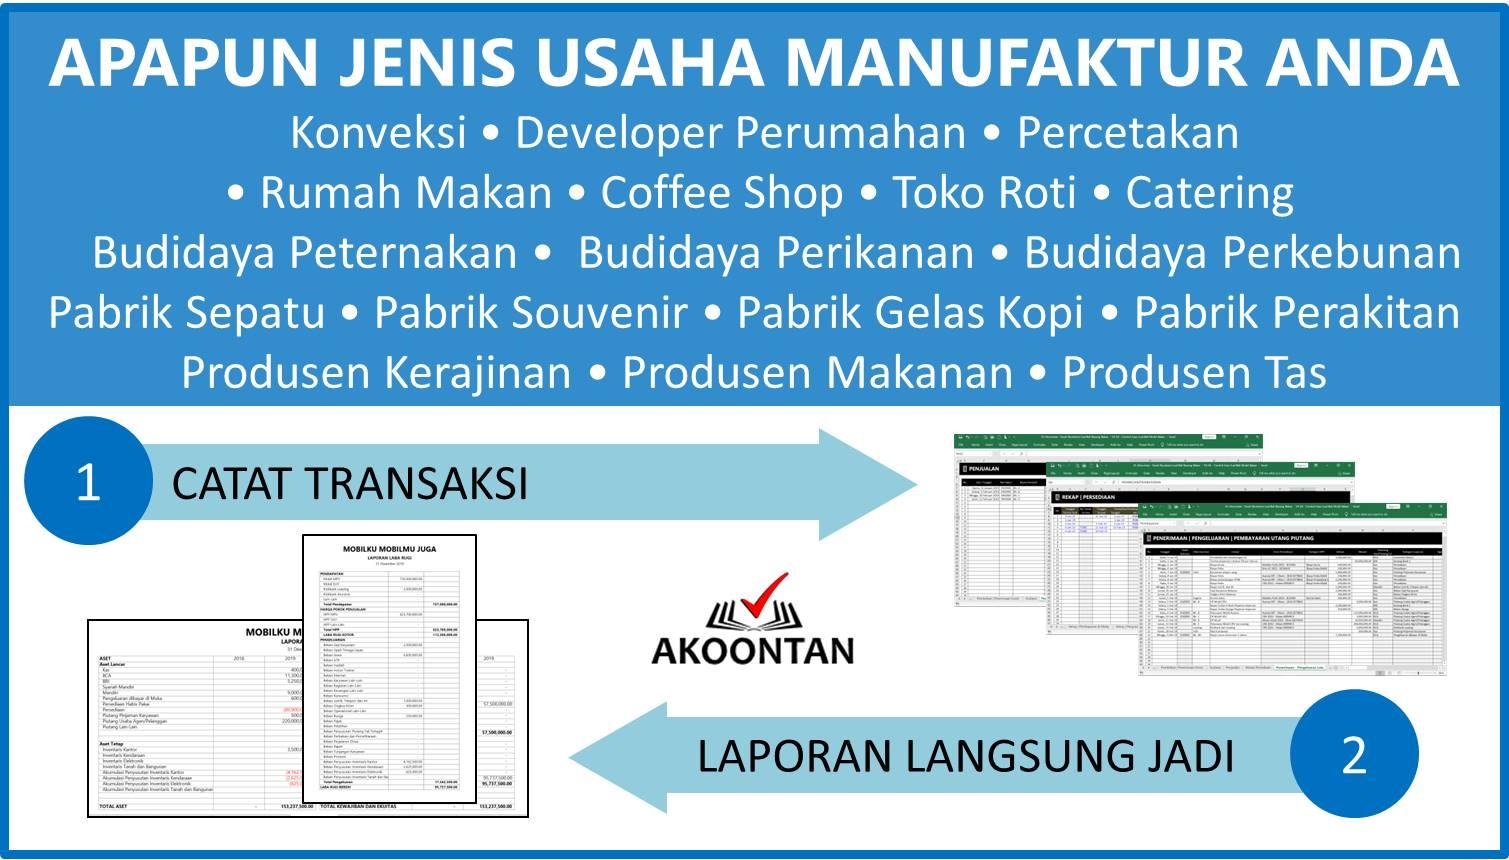 Aplikasi Akuntansi Awam untuk Perusahaan Manufaktur